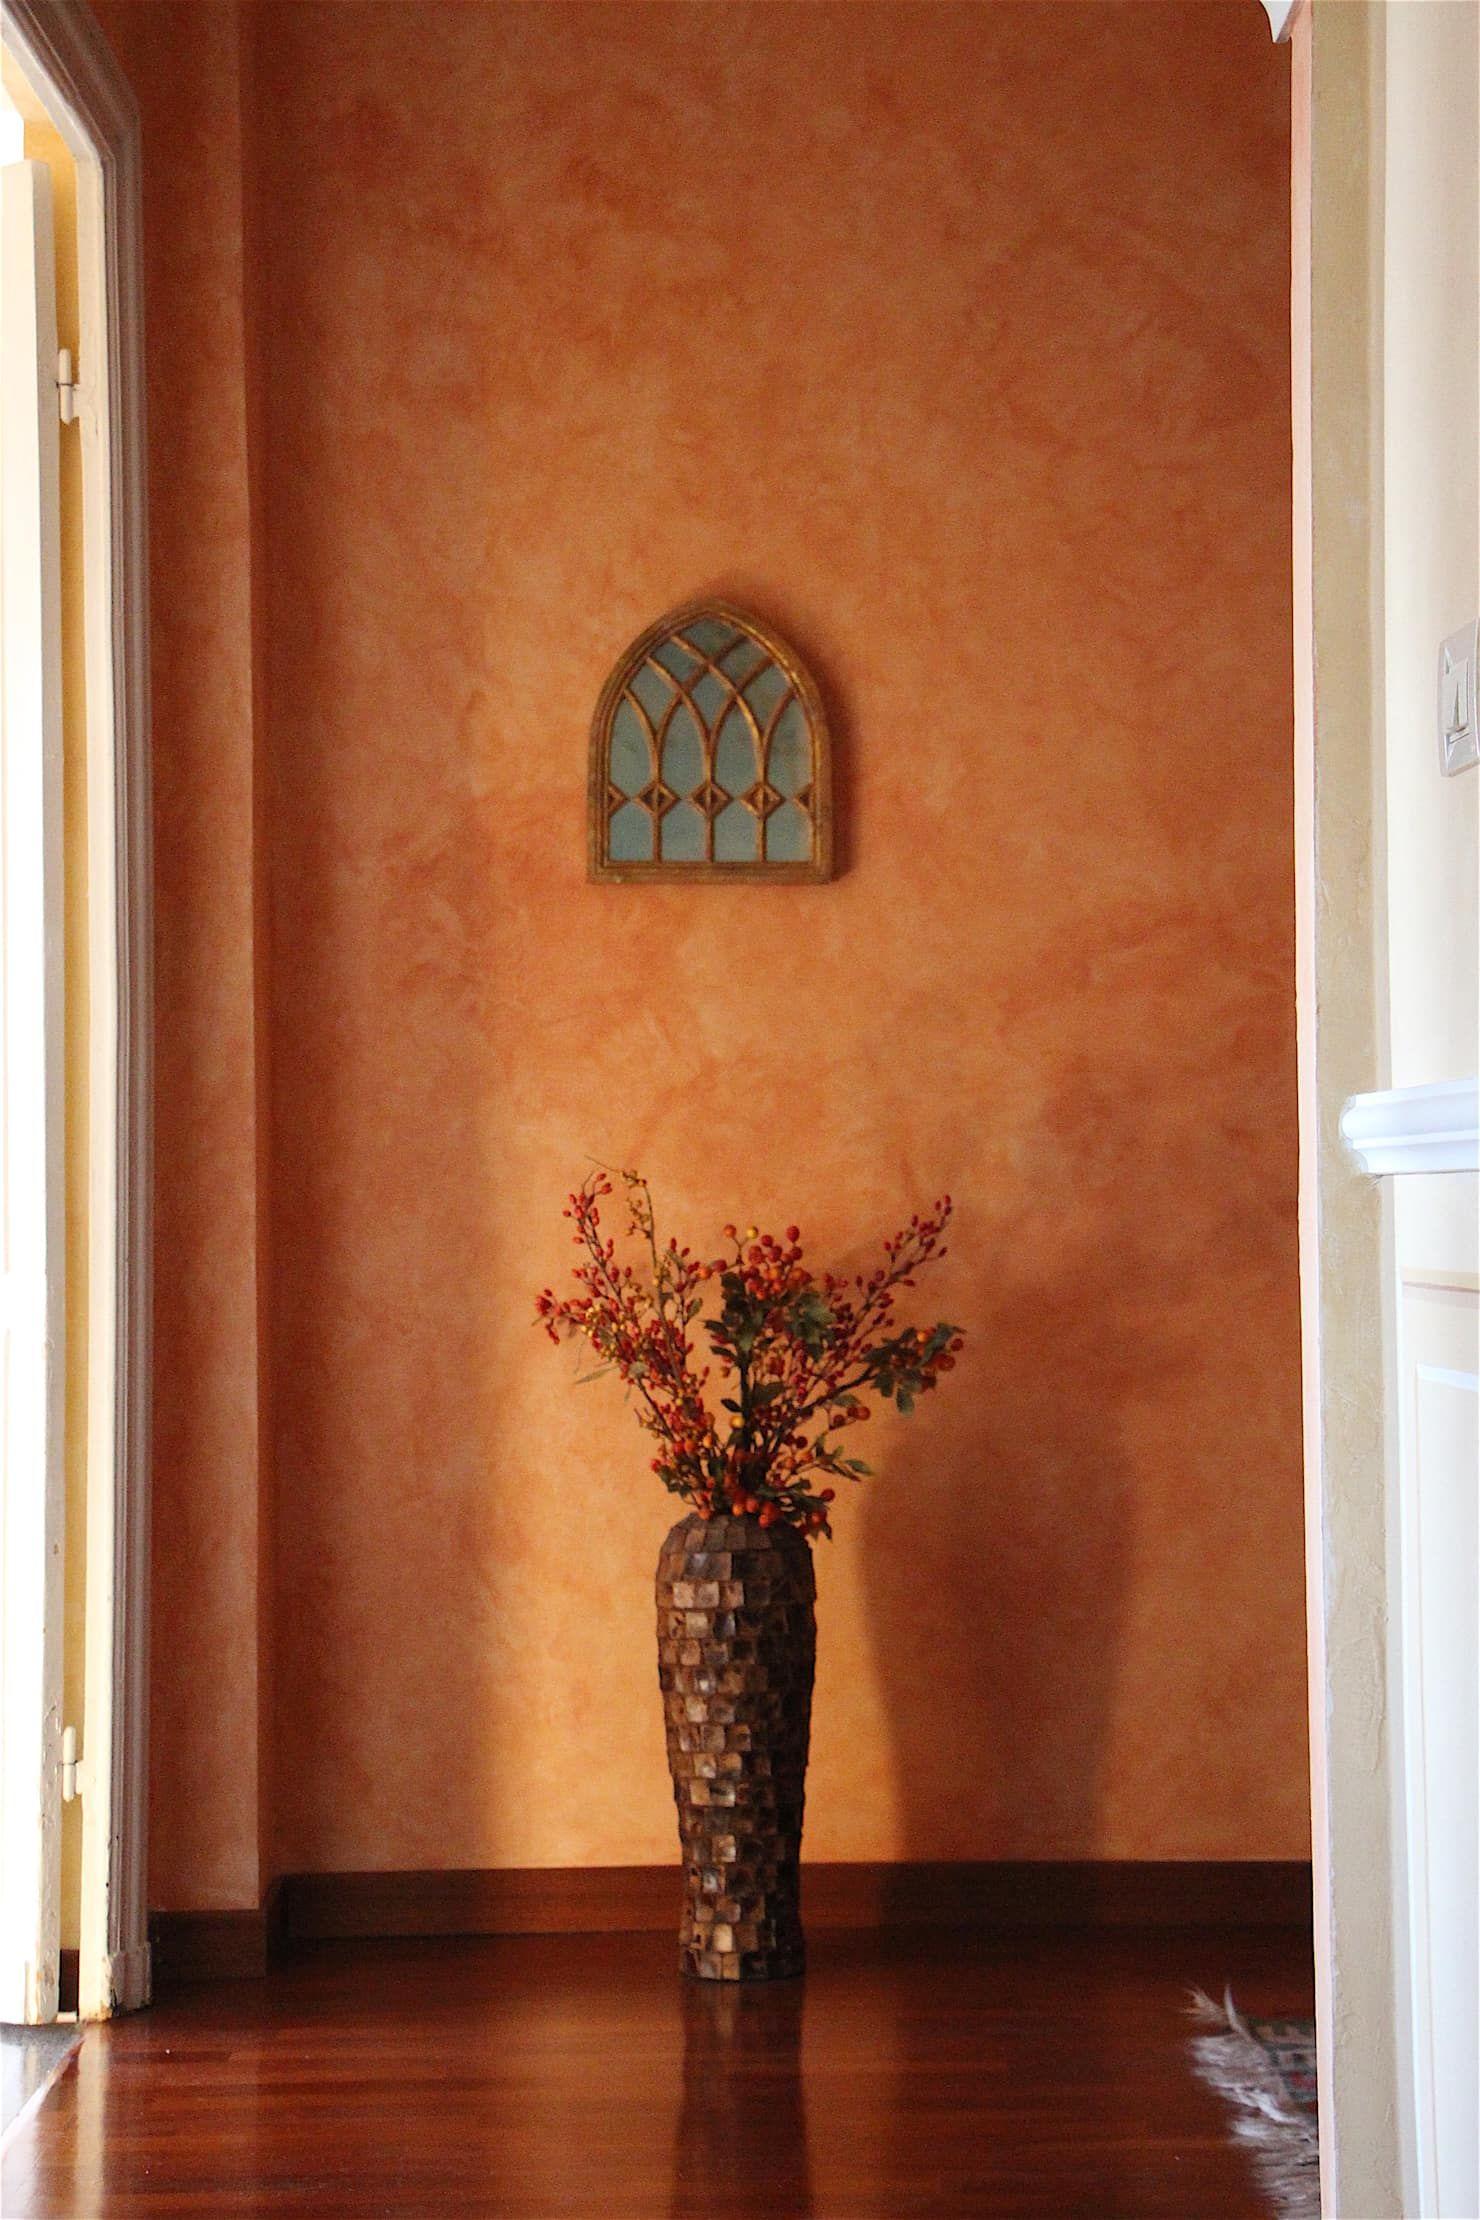 Pareti Decorate A Velatura Ingresso Corridoio In Stile Di